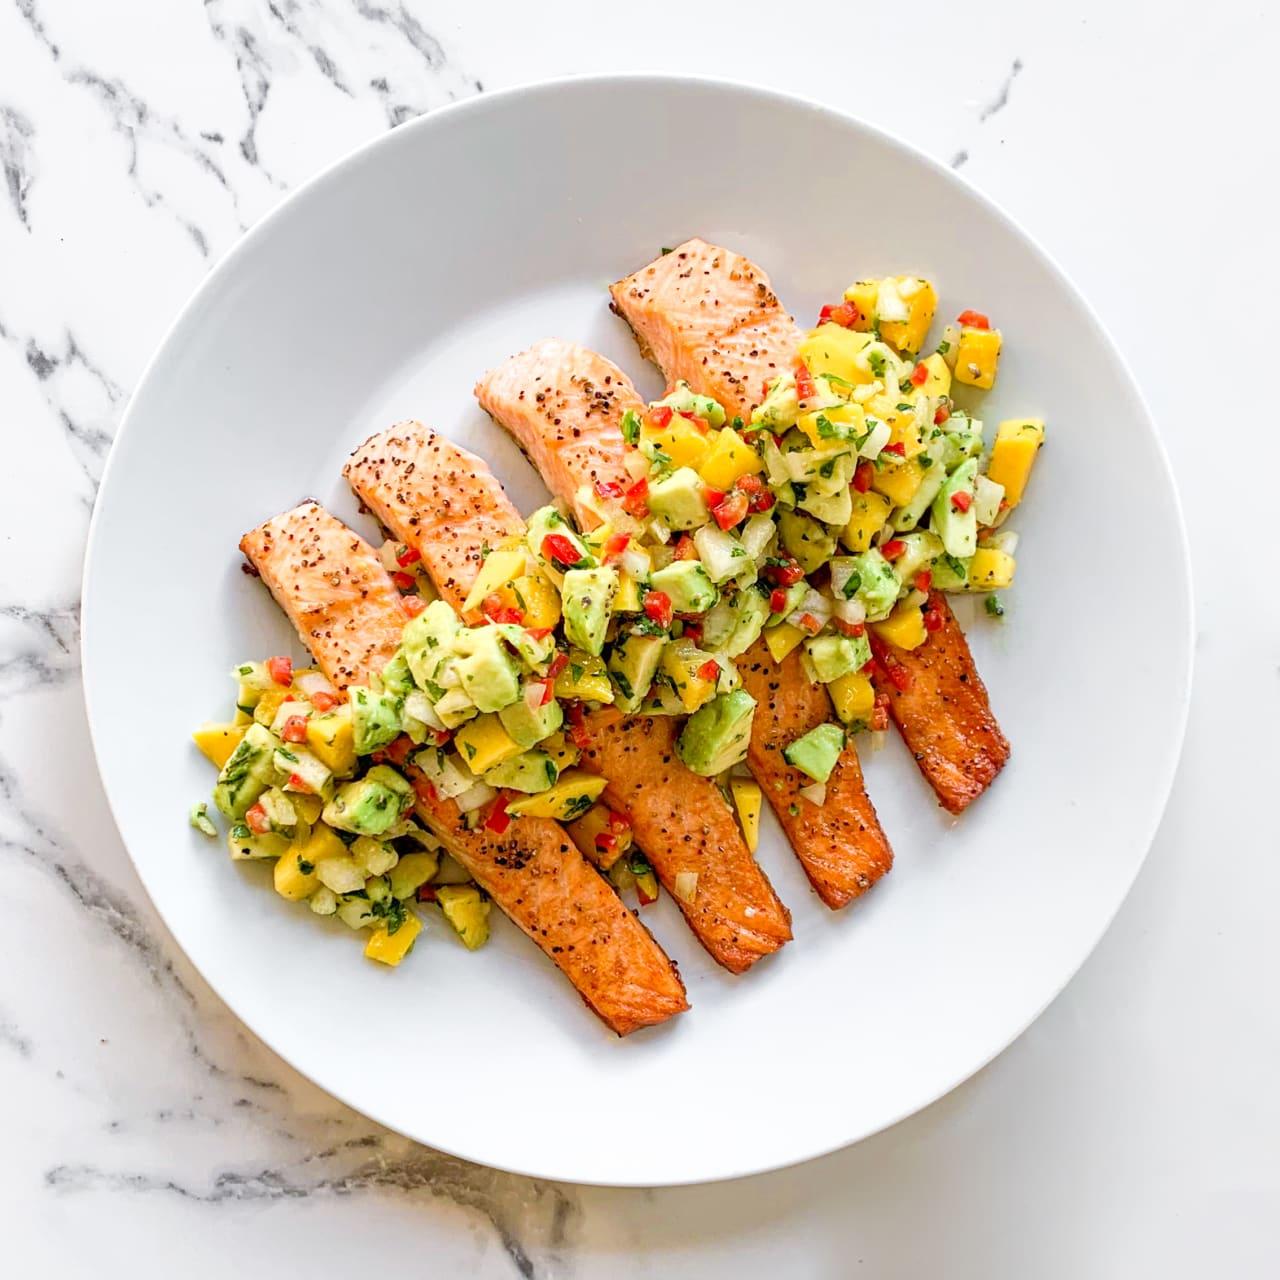 Salmon with Mango & Avocado Salsa